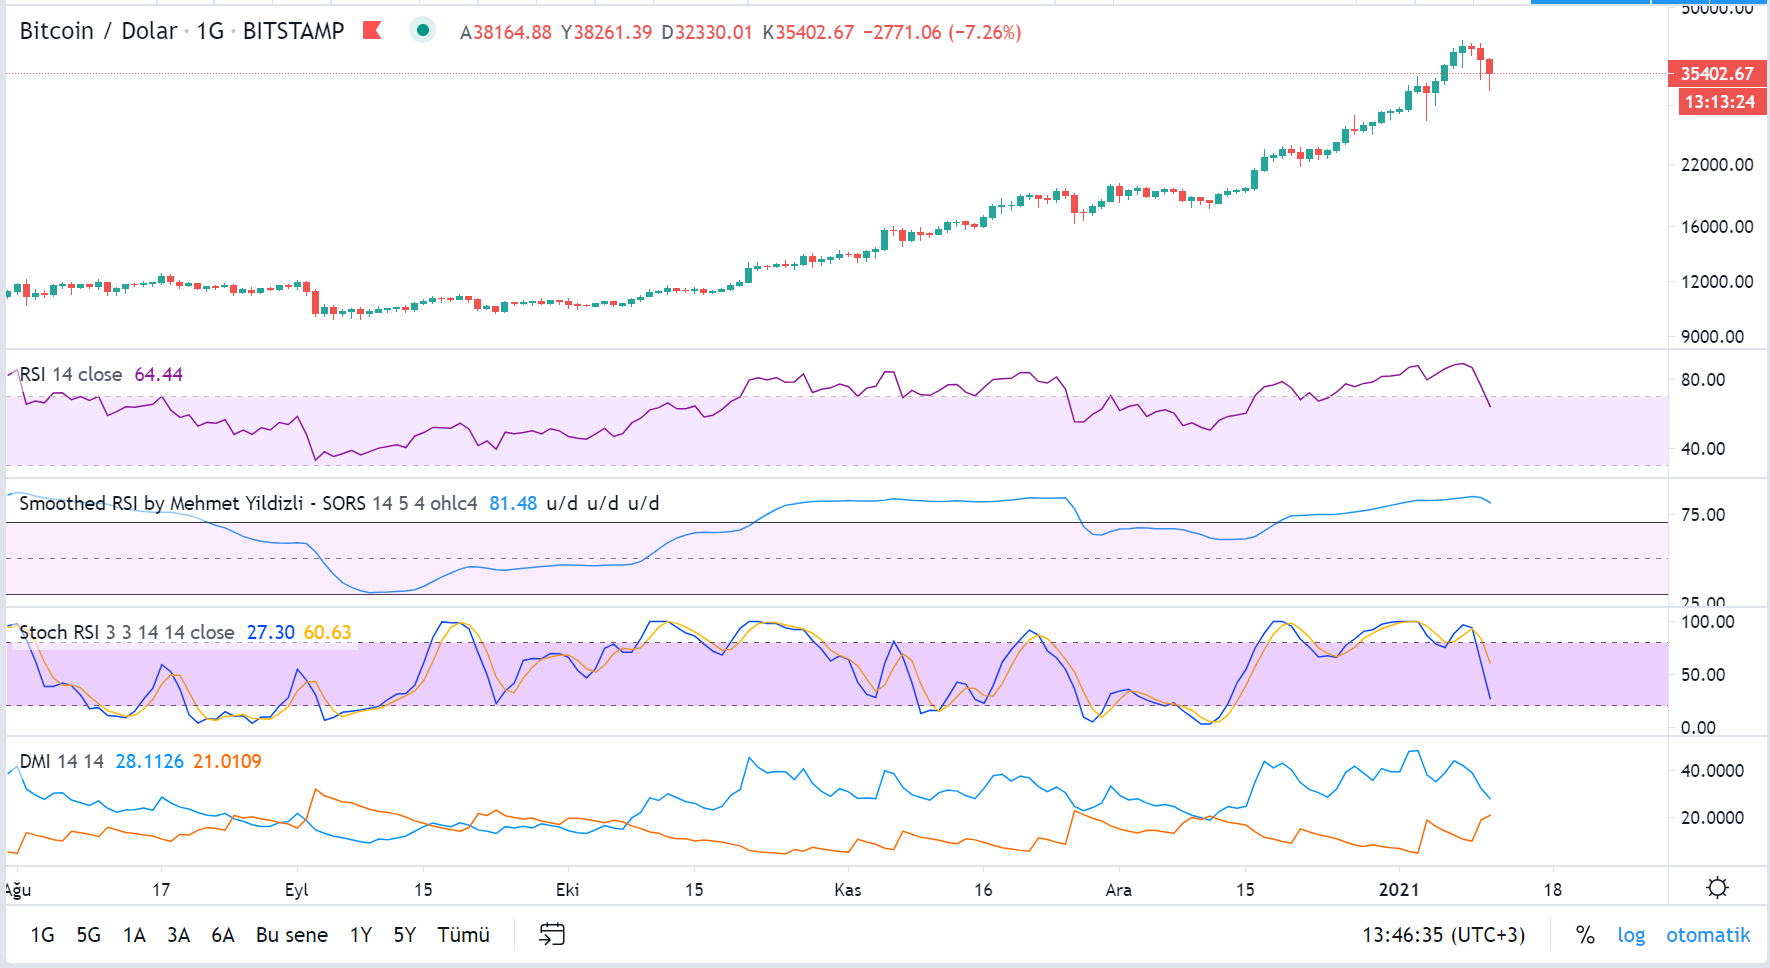 bitcoinin dolar bazinda teknik analizi 11 ocak 2021 4